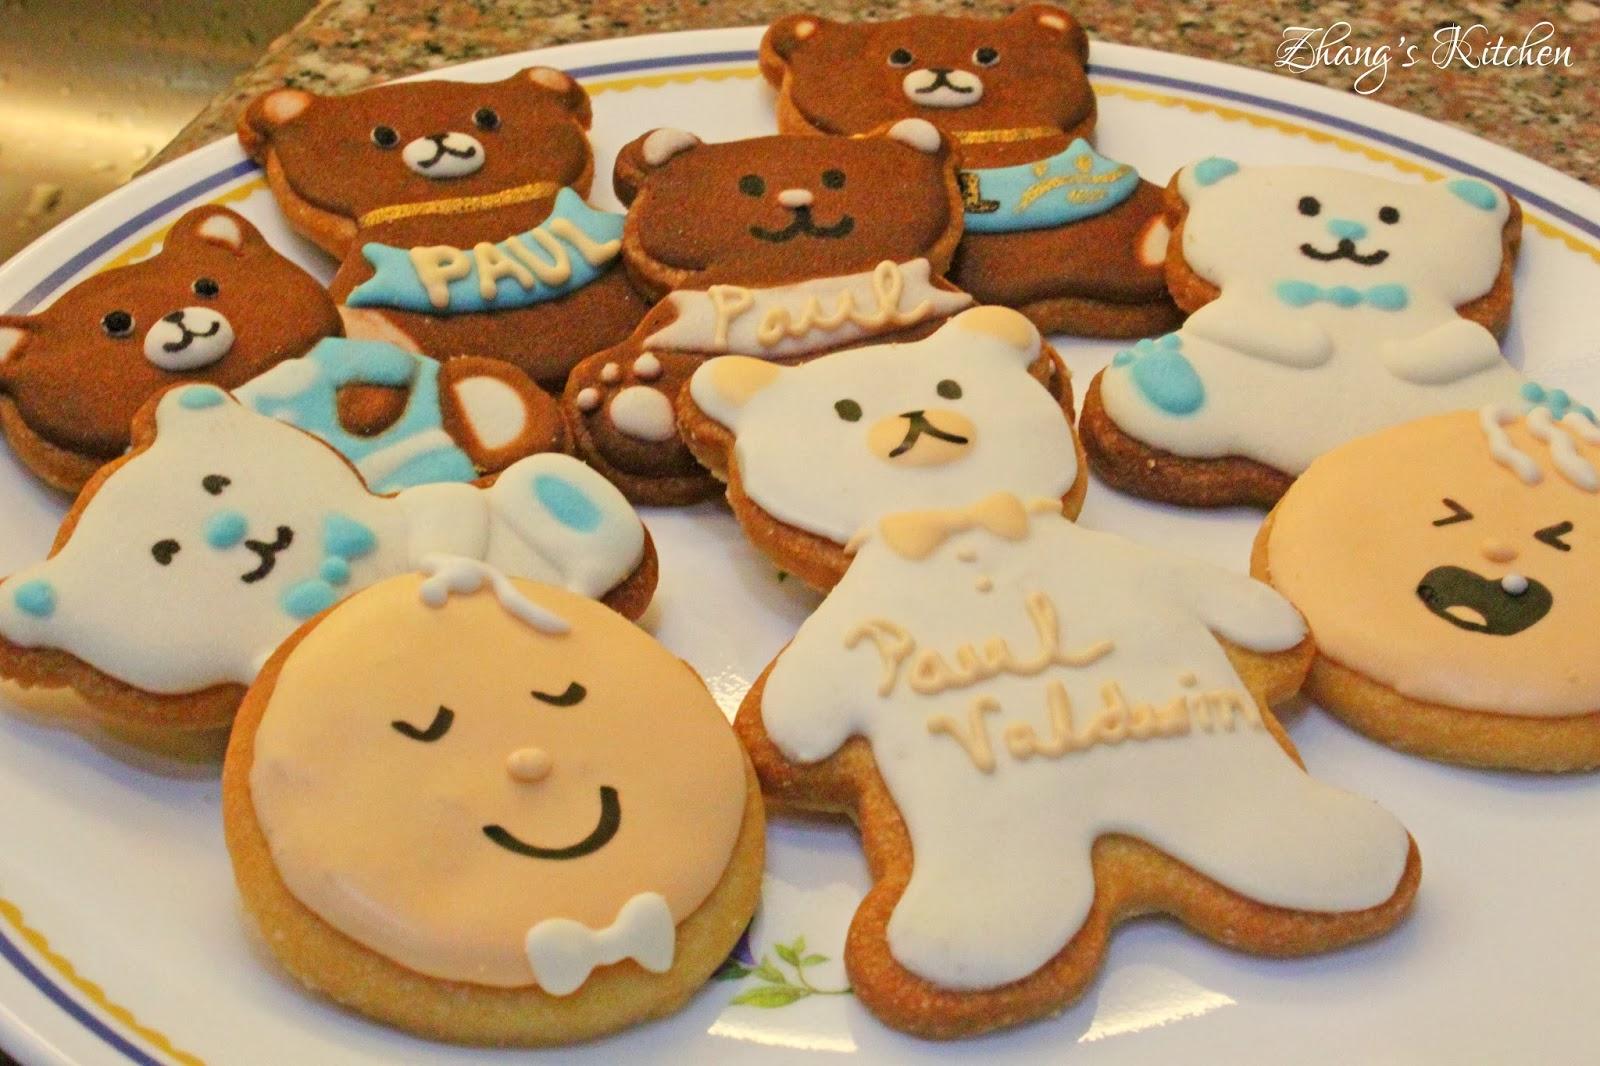 Wilton Teddy Bear Cake Pan Instructions